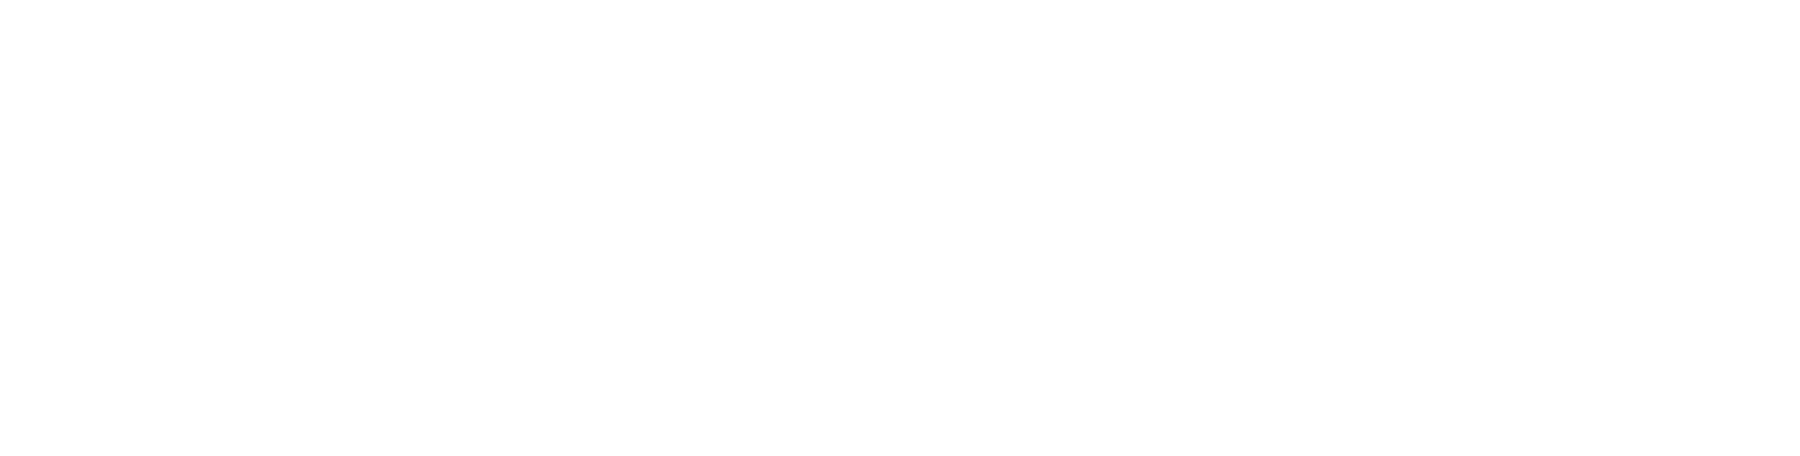 WDYK? Trivia